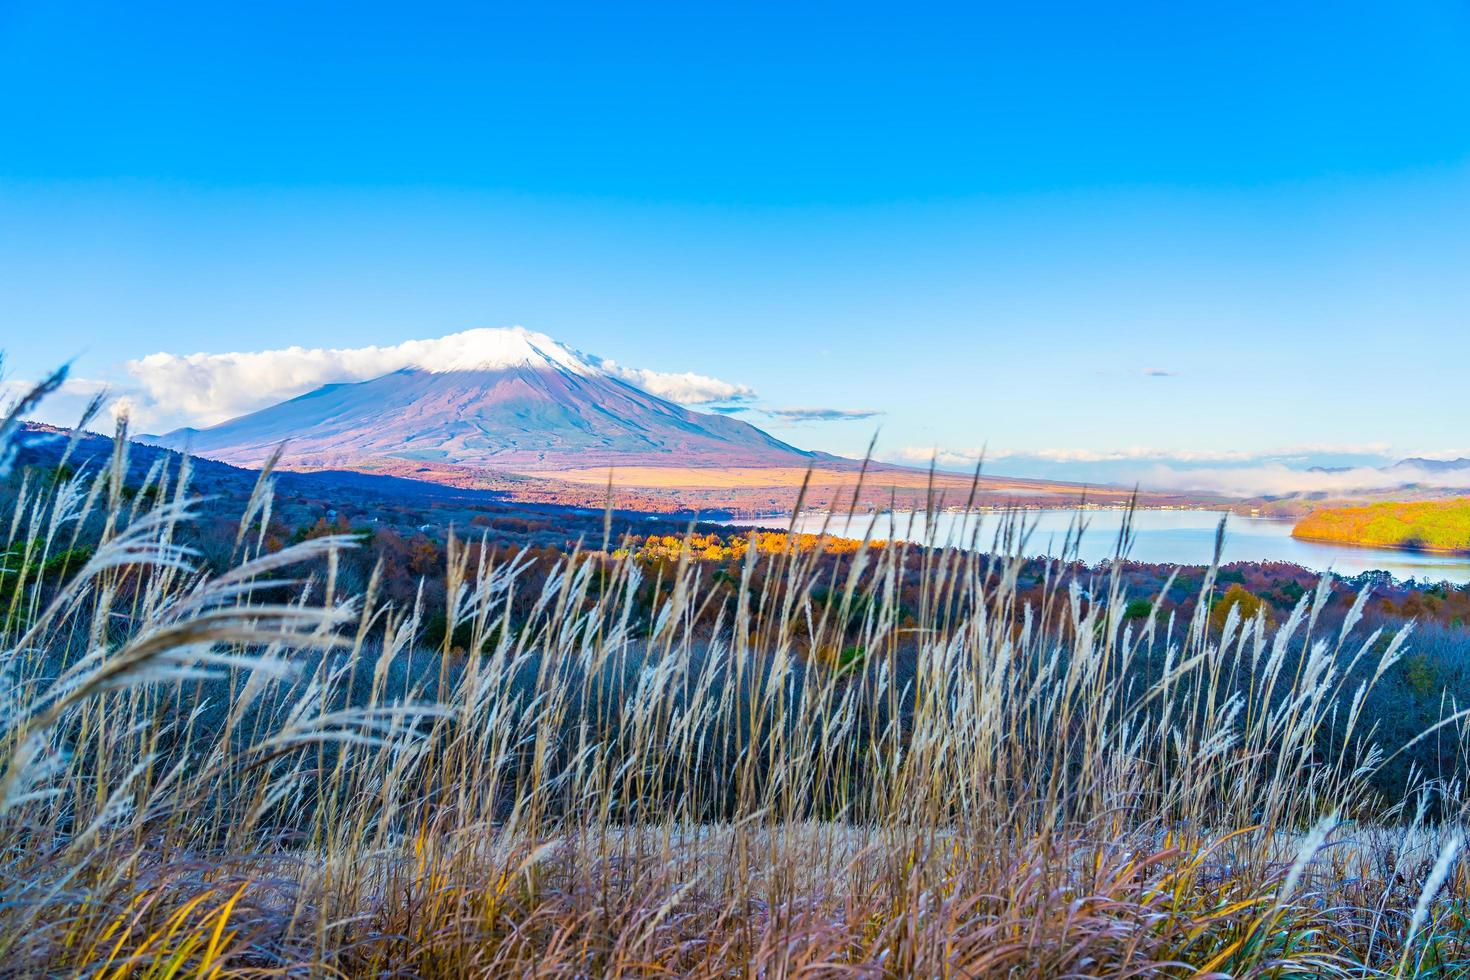 Fuji Berg bei Yamanakako oder Yamanaka See in Japan foto